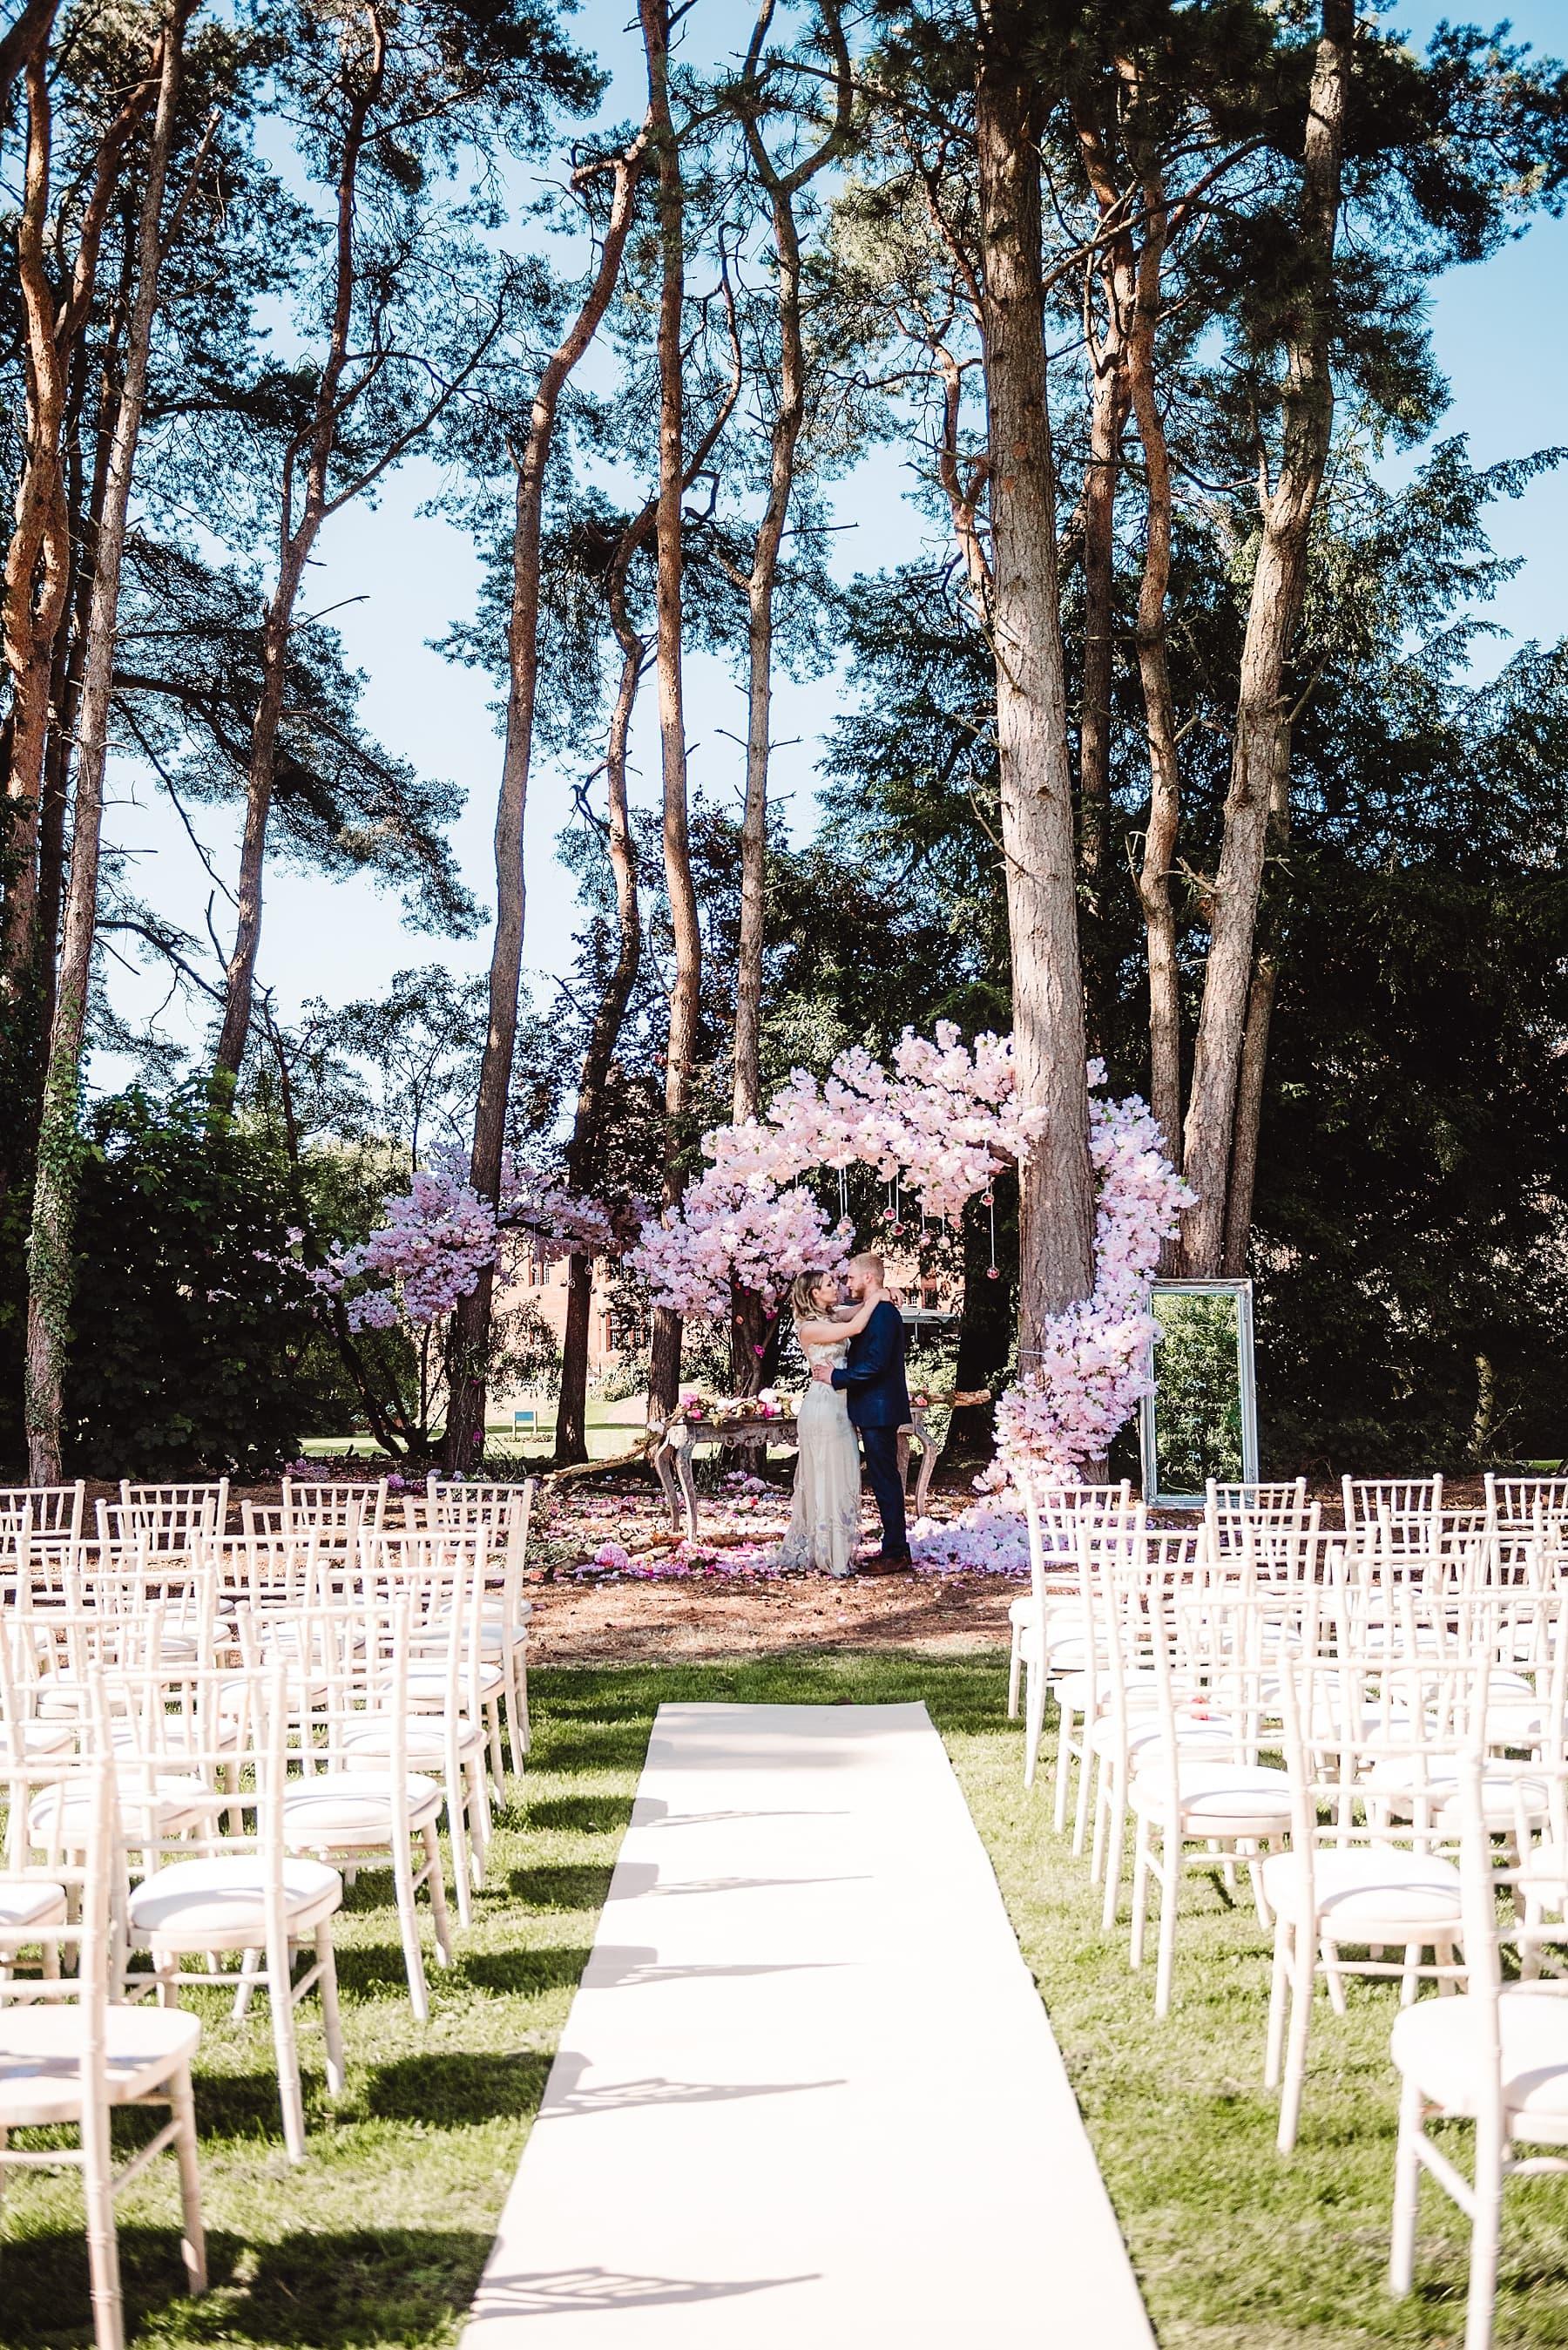 Discover a Lake District Wedding Venue | Cumbria Wedding Venue